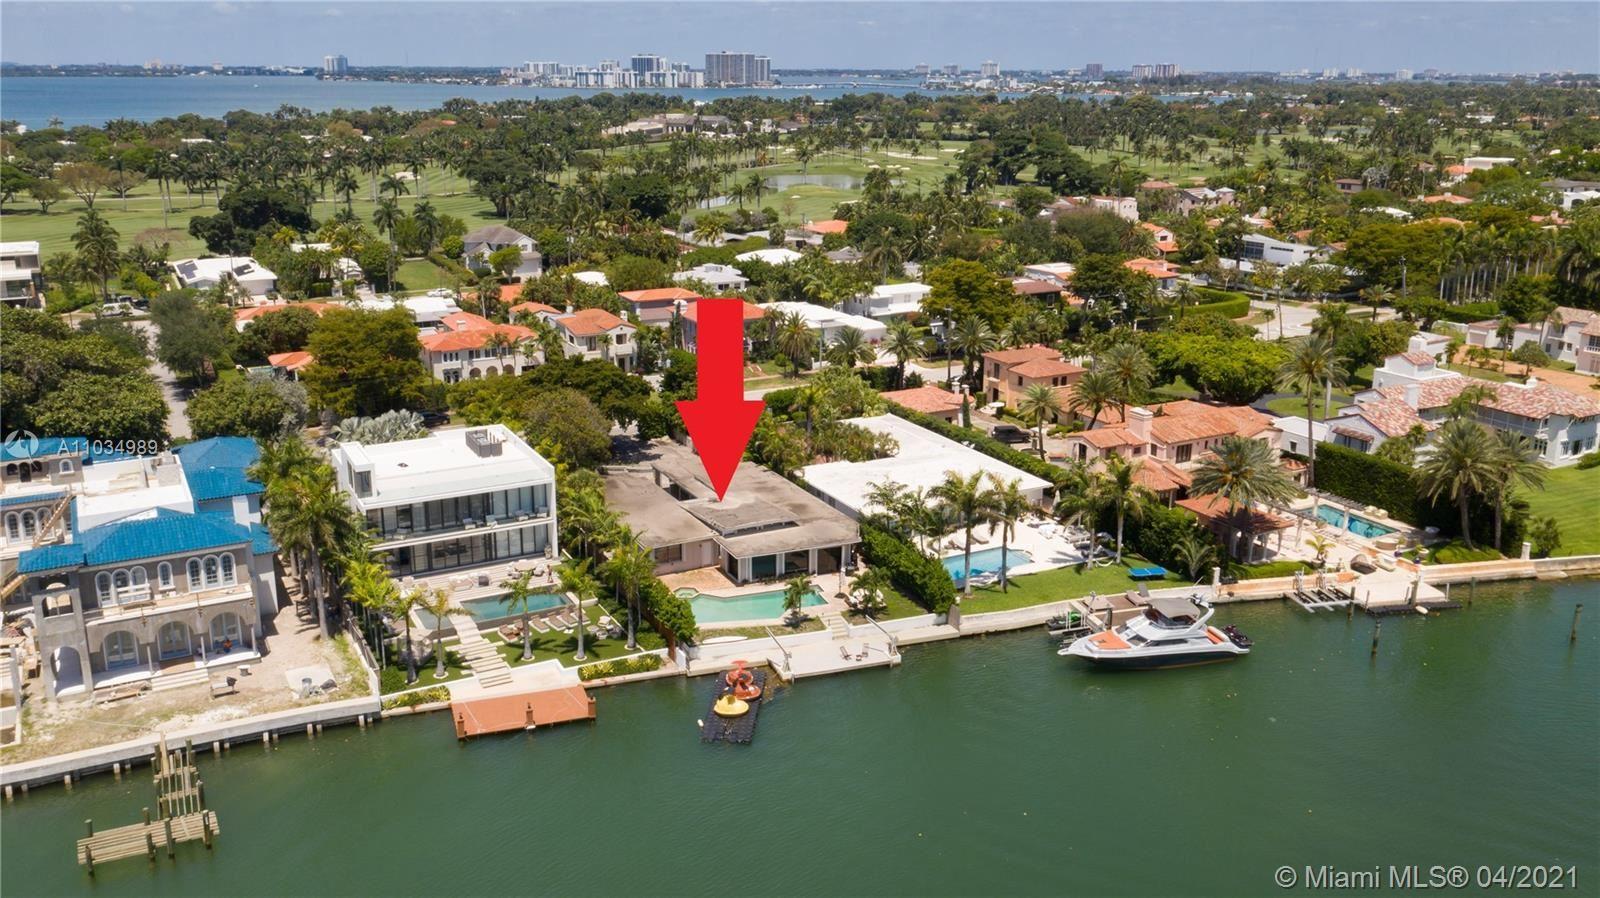 Photo of 5515 Pine Tree Dr, Miami Beach, FL 33140 (MLS # A11034989)